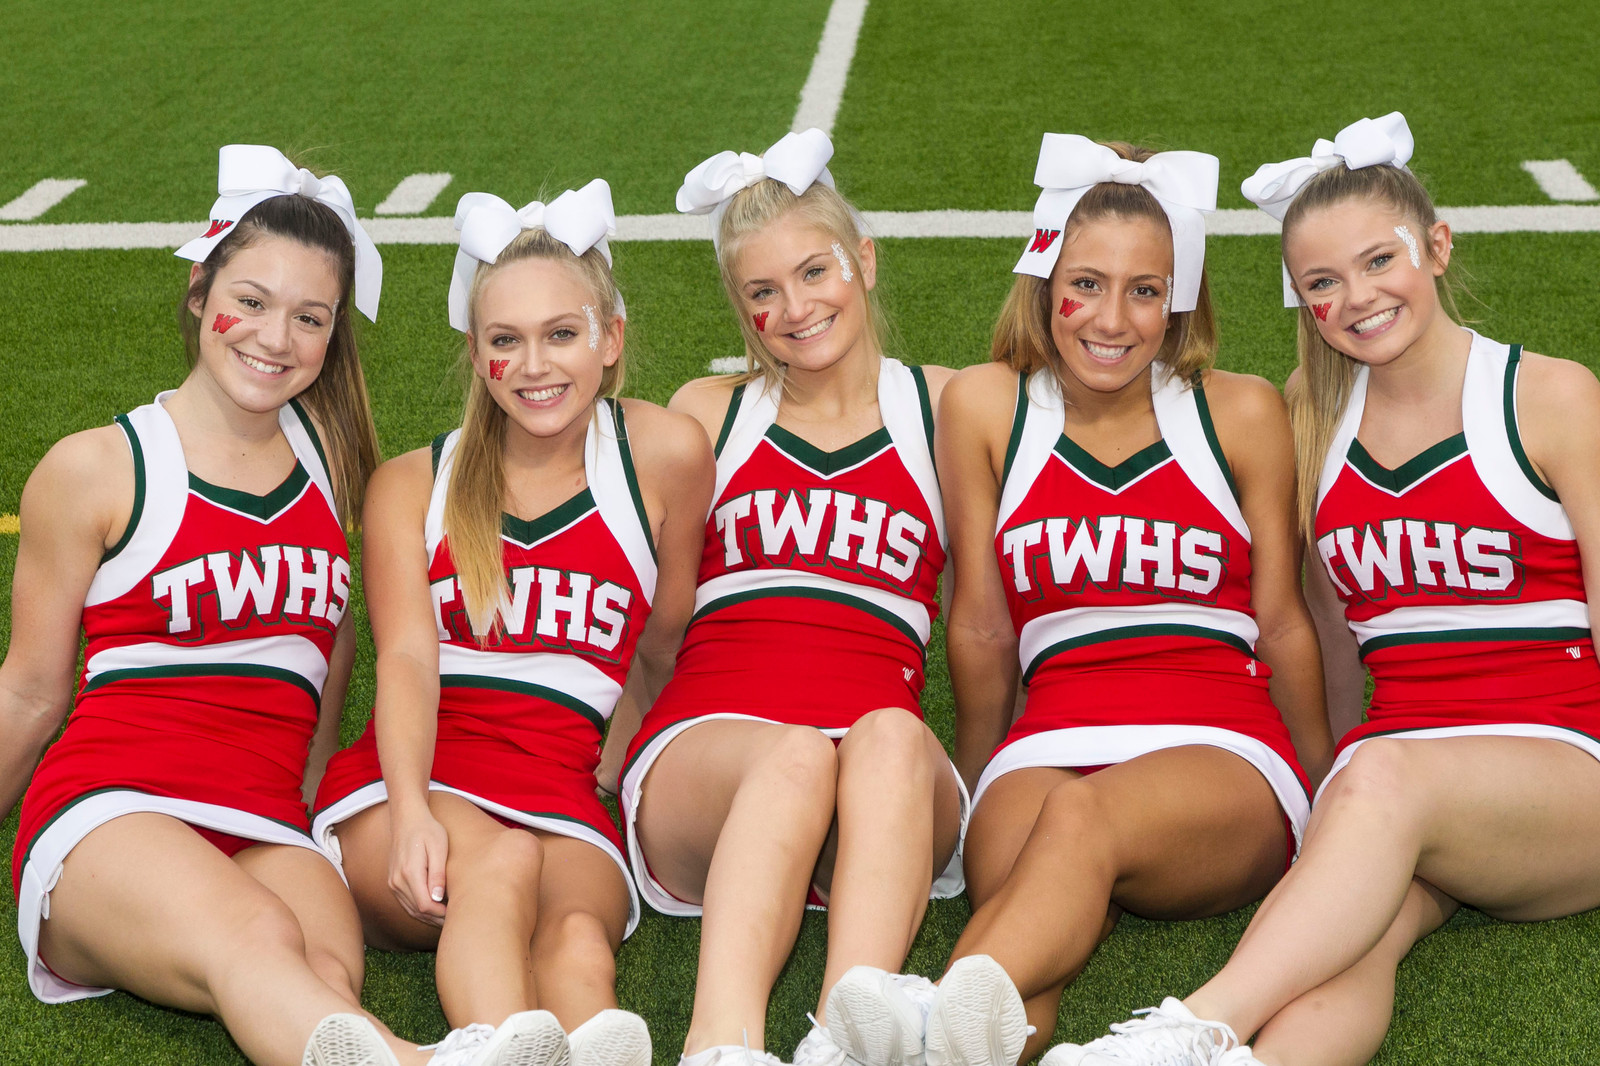 godess-kate-sexy-cheerleaders-high-school